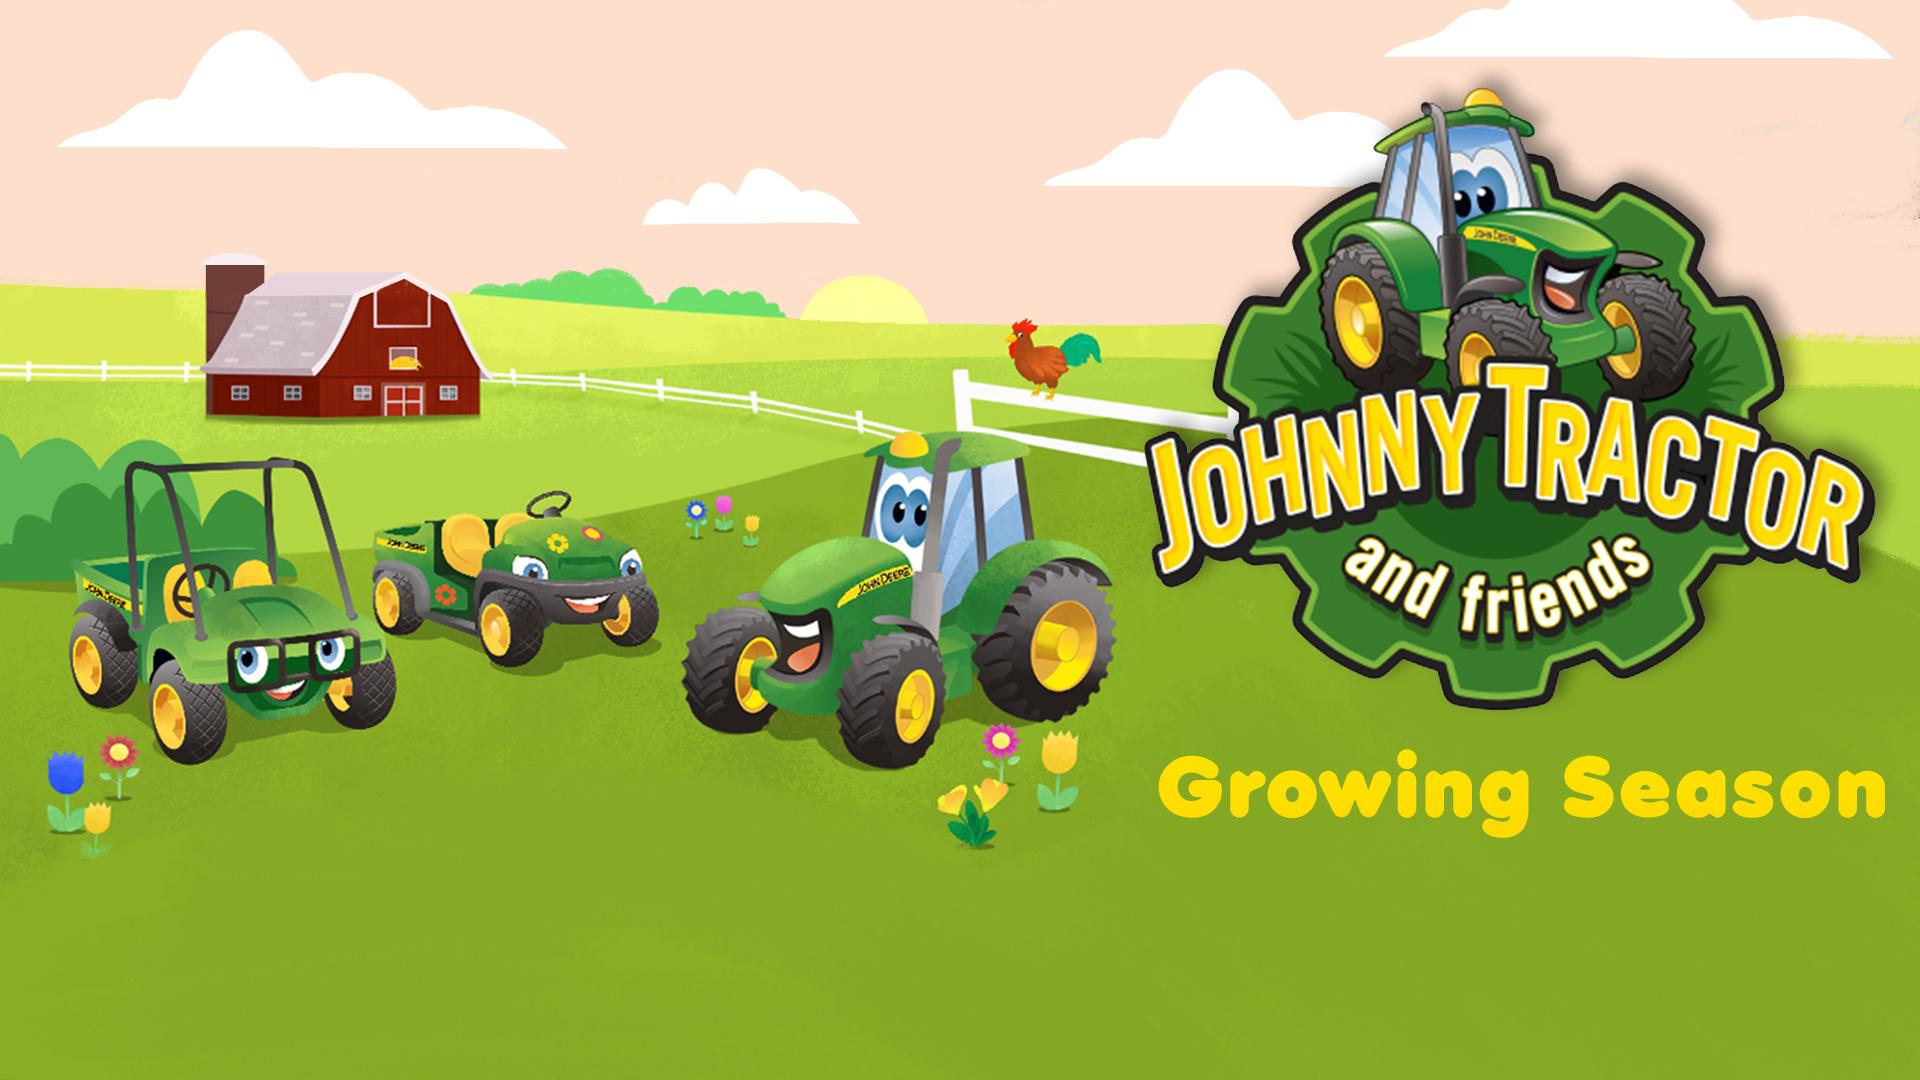 Johnny Tractor Growing Season